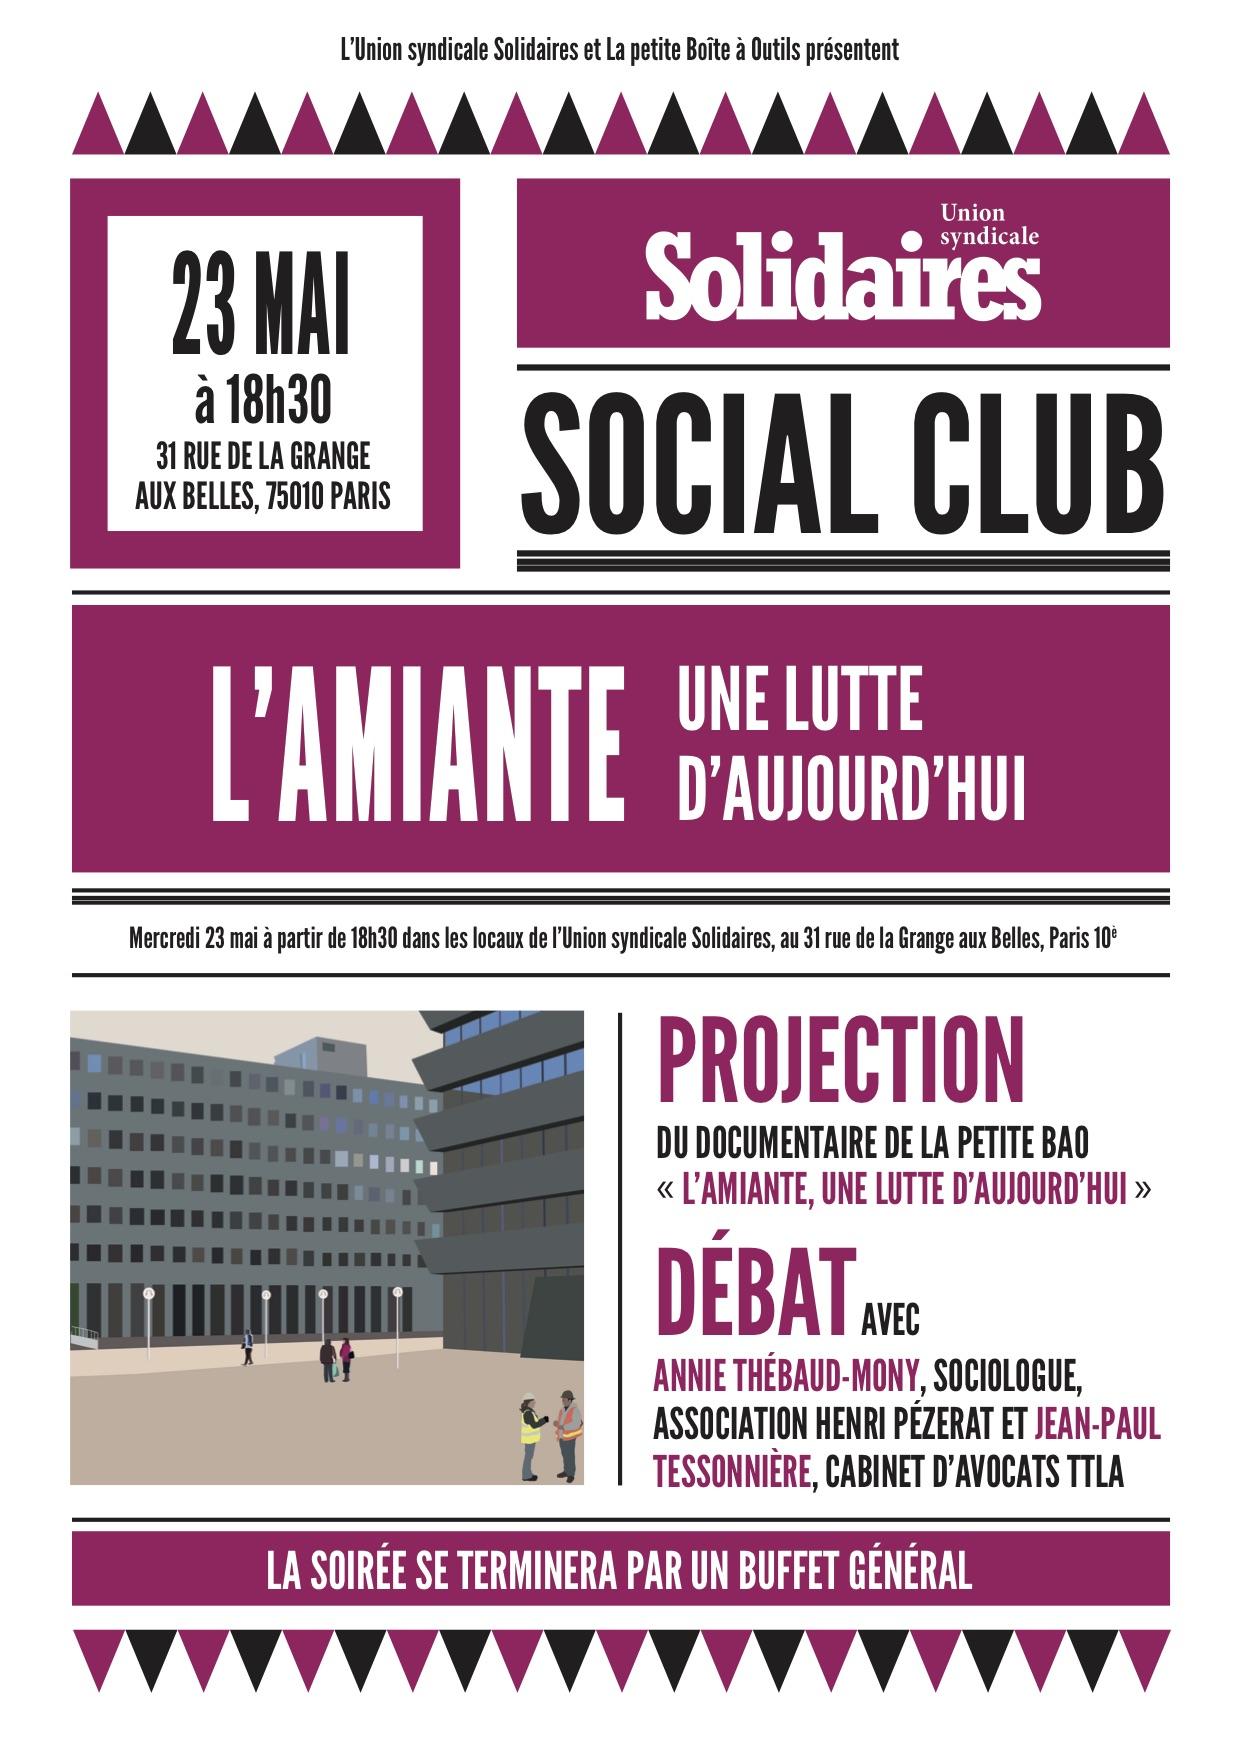 Solidaires social club Lamiante, une lutte daujourdhui